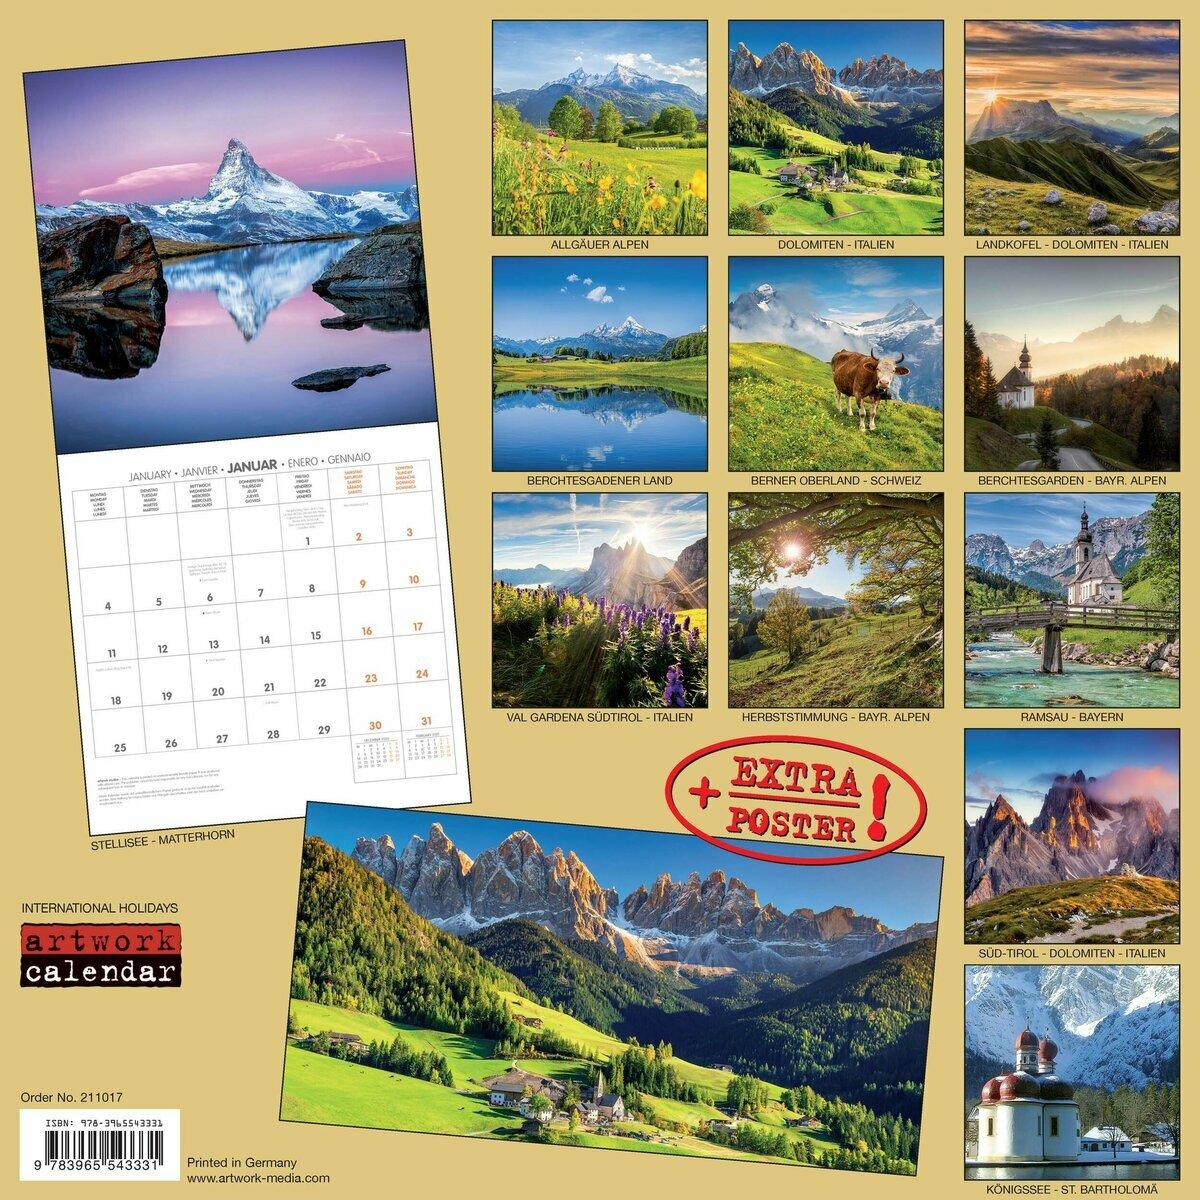 Calendrier 2021 Alpes AVEC POSTER OFFER